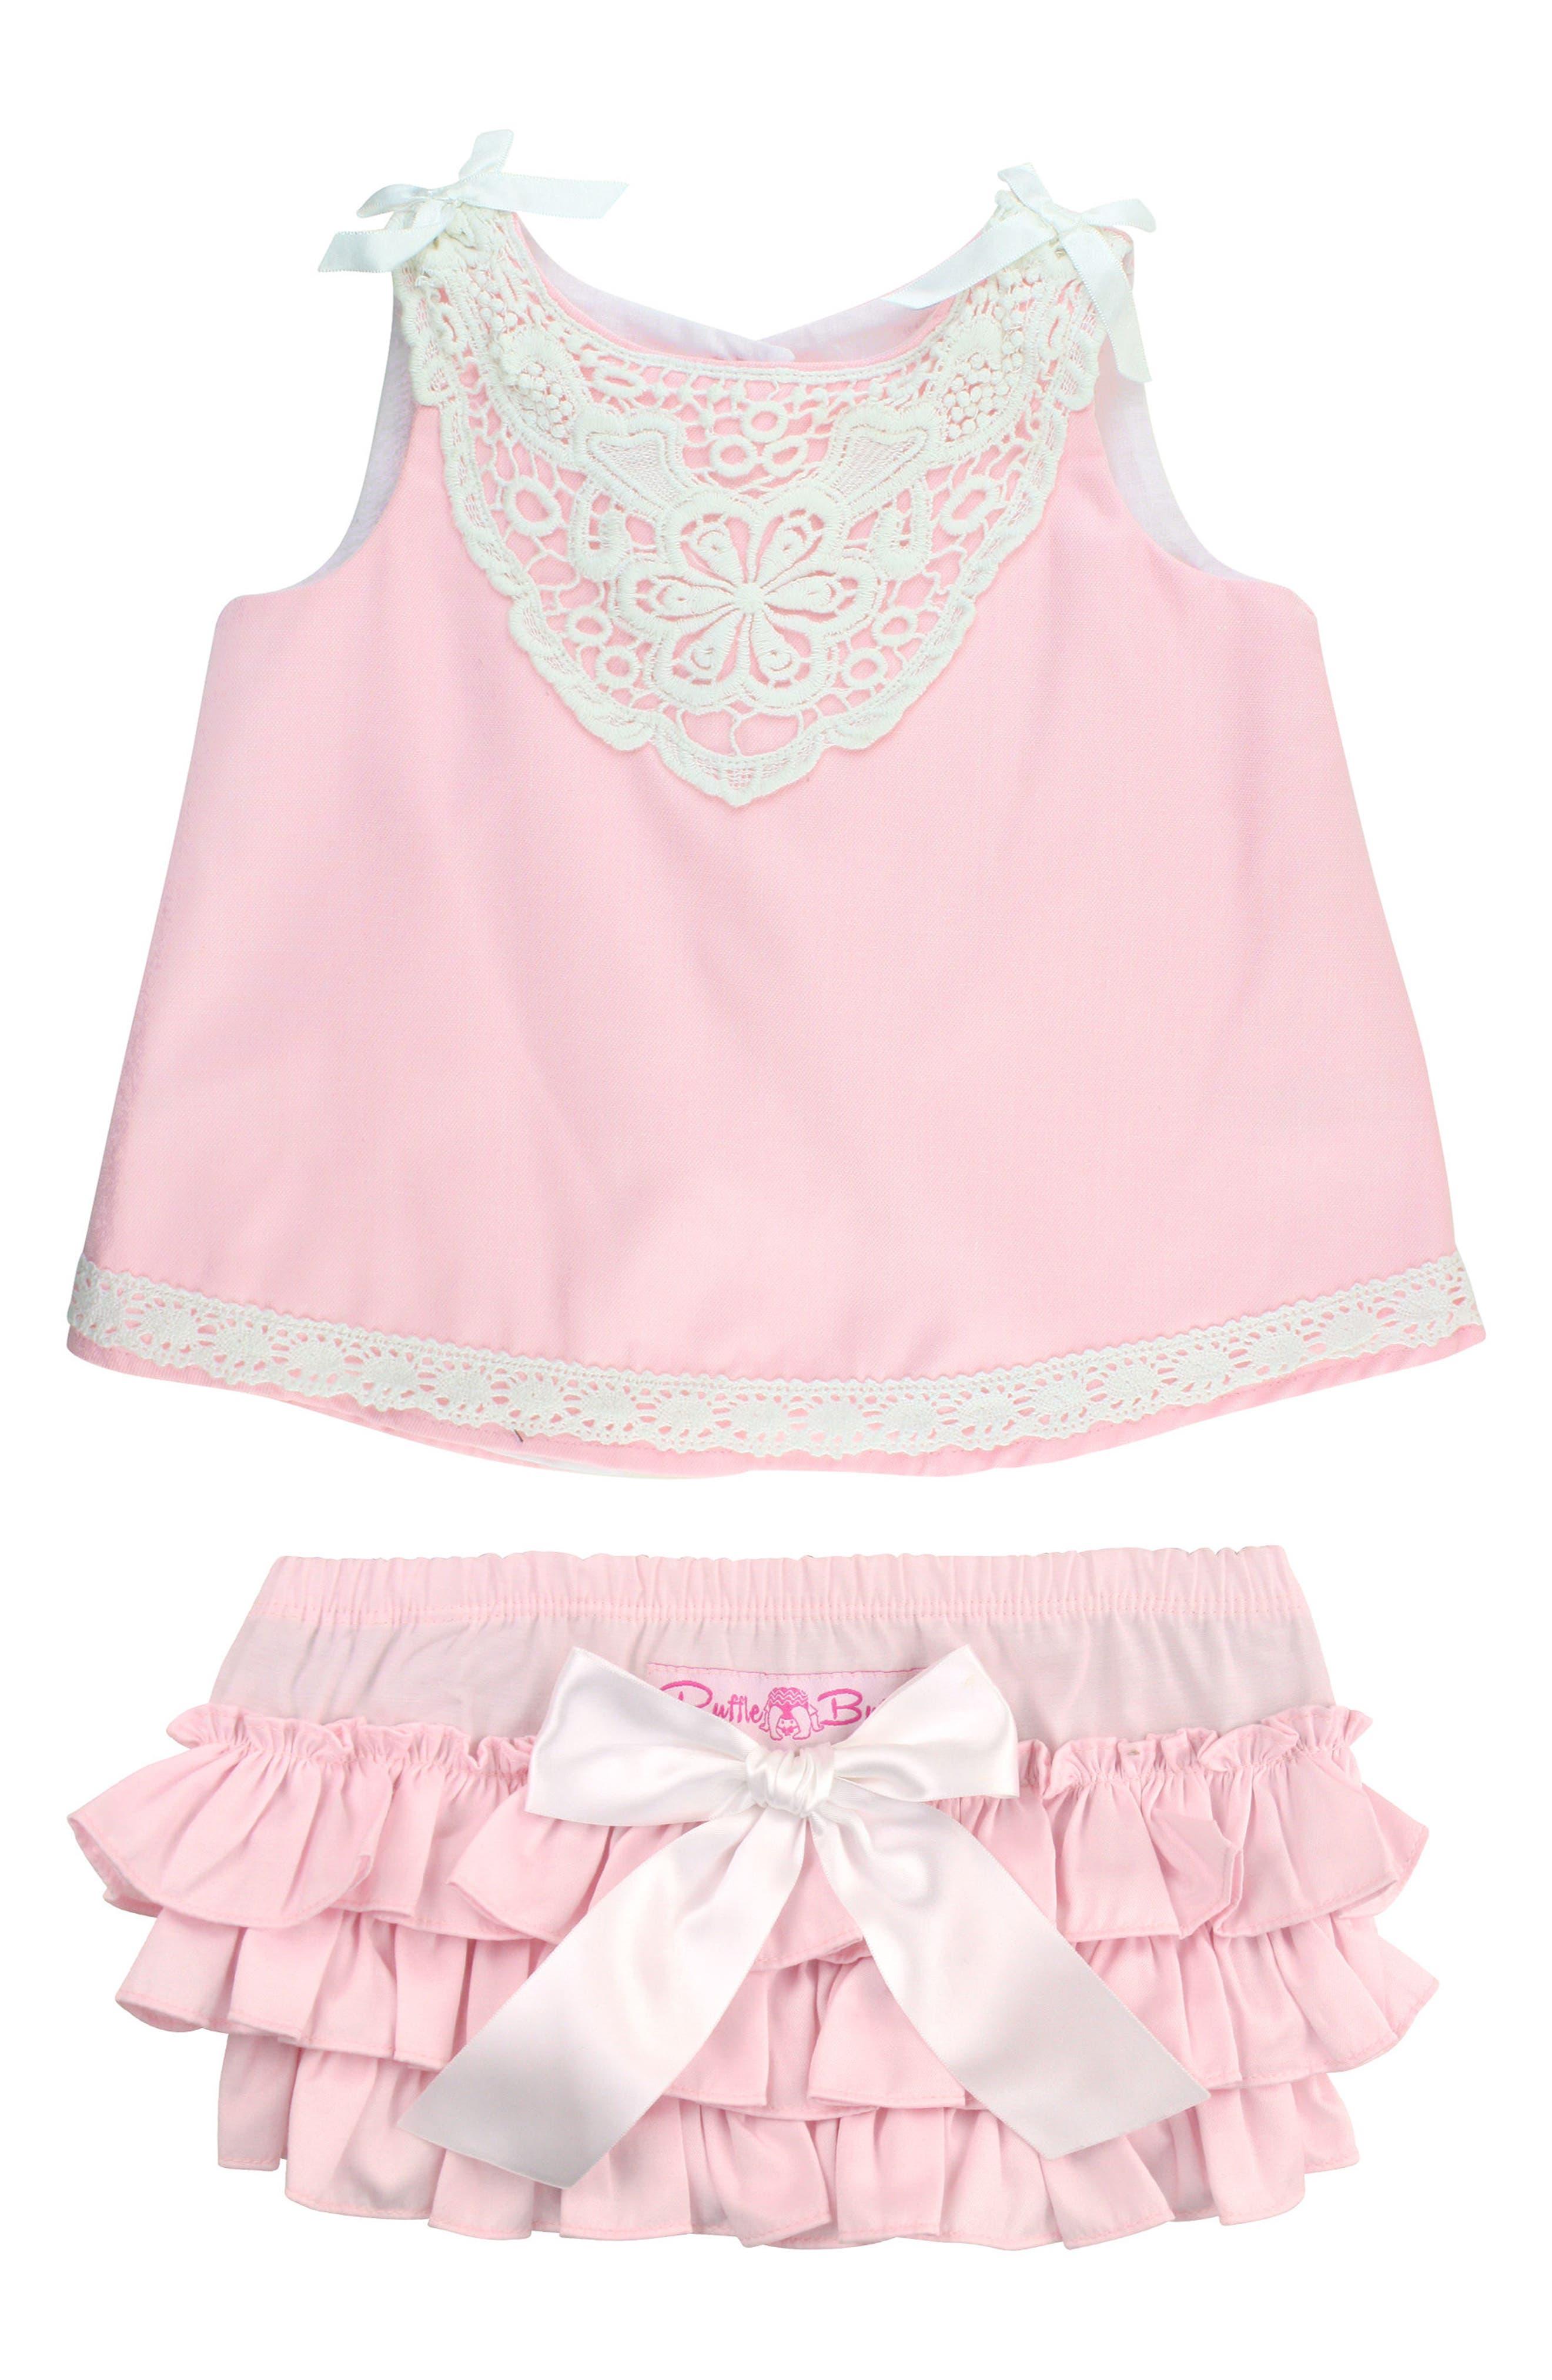 Chambray Swing Top & Ruffle Bloomers Set,                             Main thumbnail 1, color,                             Pink